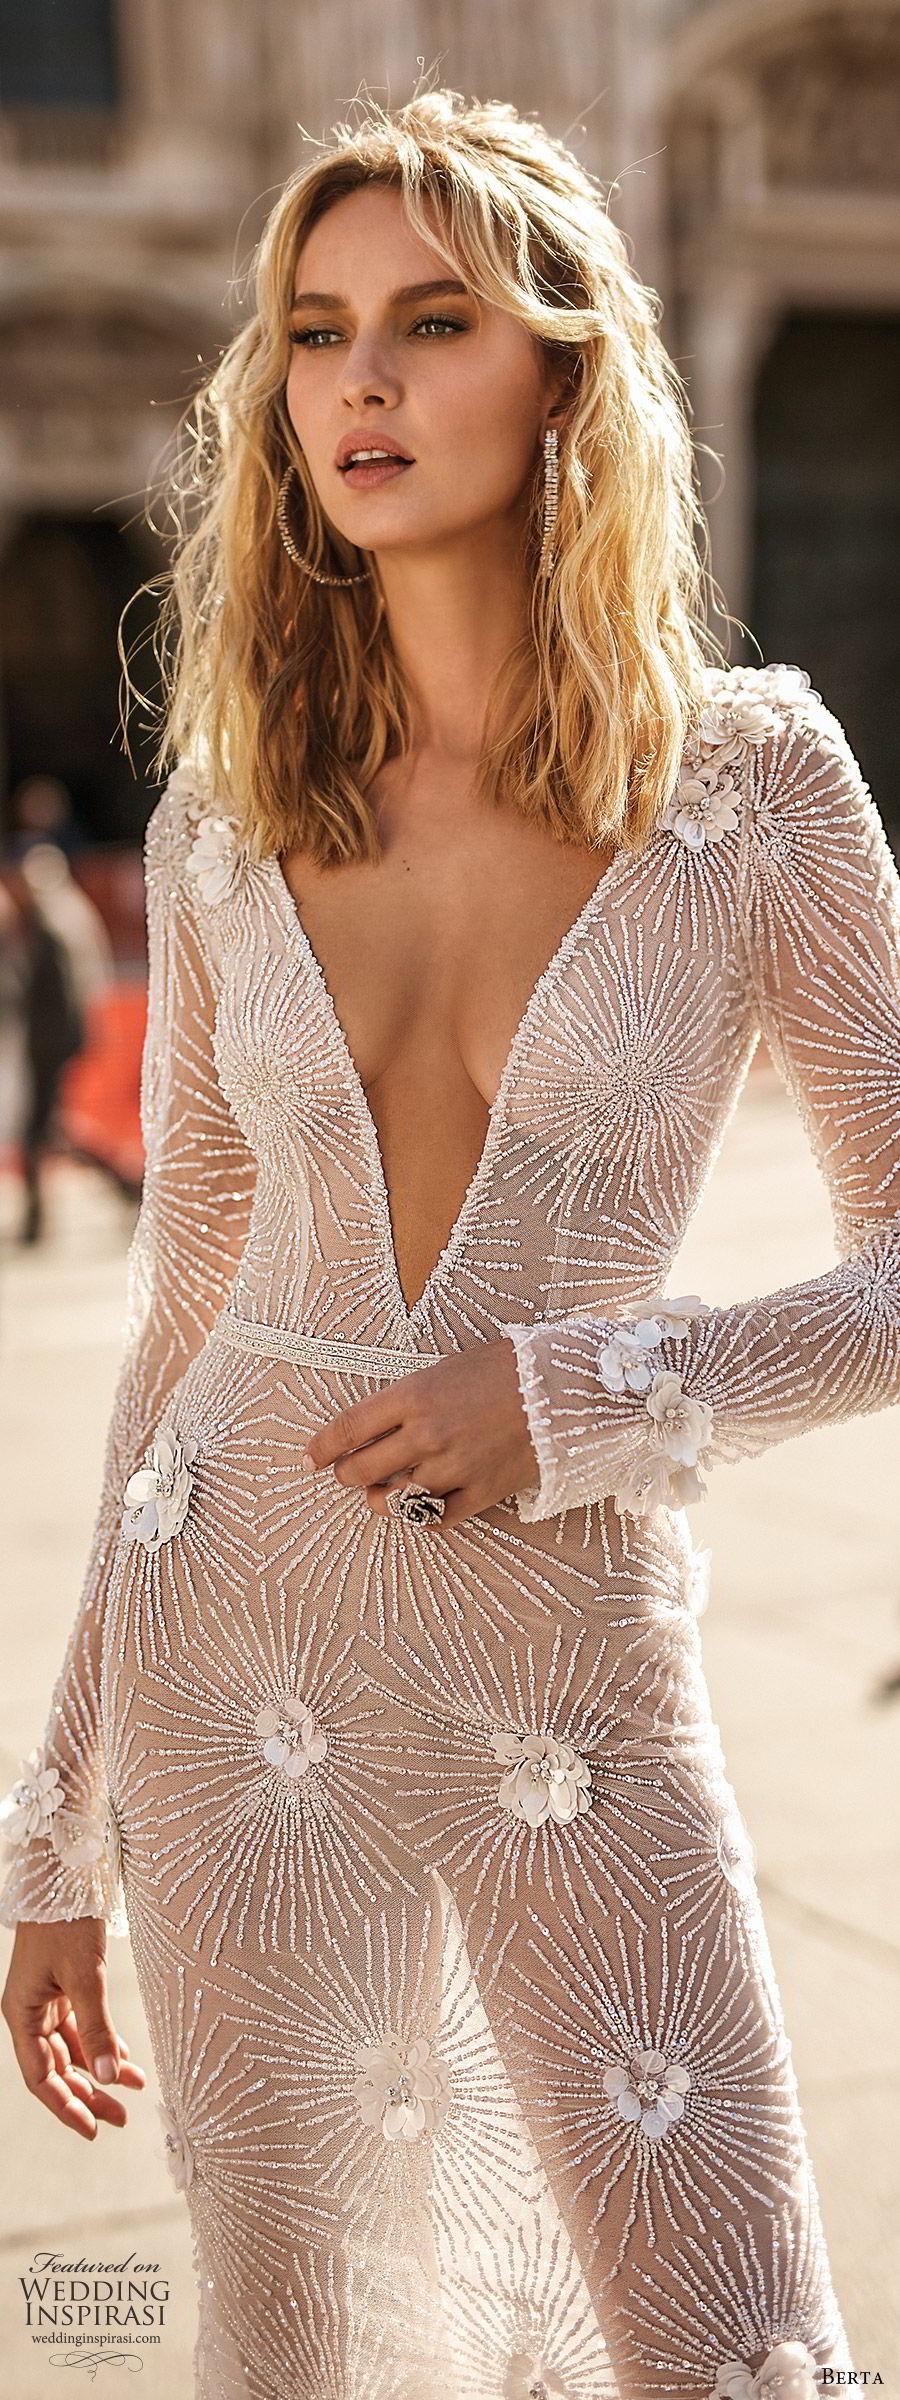 berta spring 2020 bridal illusion long sleeves deep v neckline fully embellished sheath wedding dress (12) sheer skirt chapel train glitzy glam mv